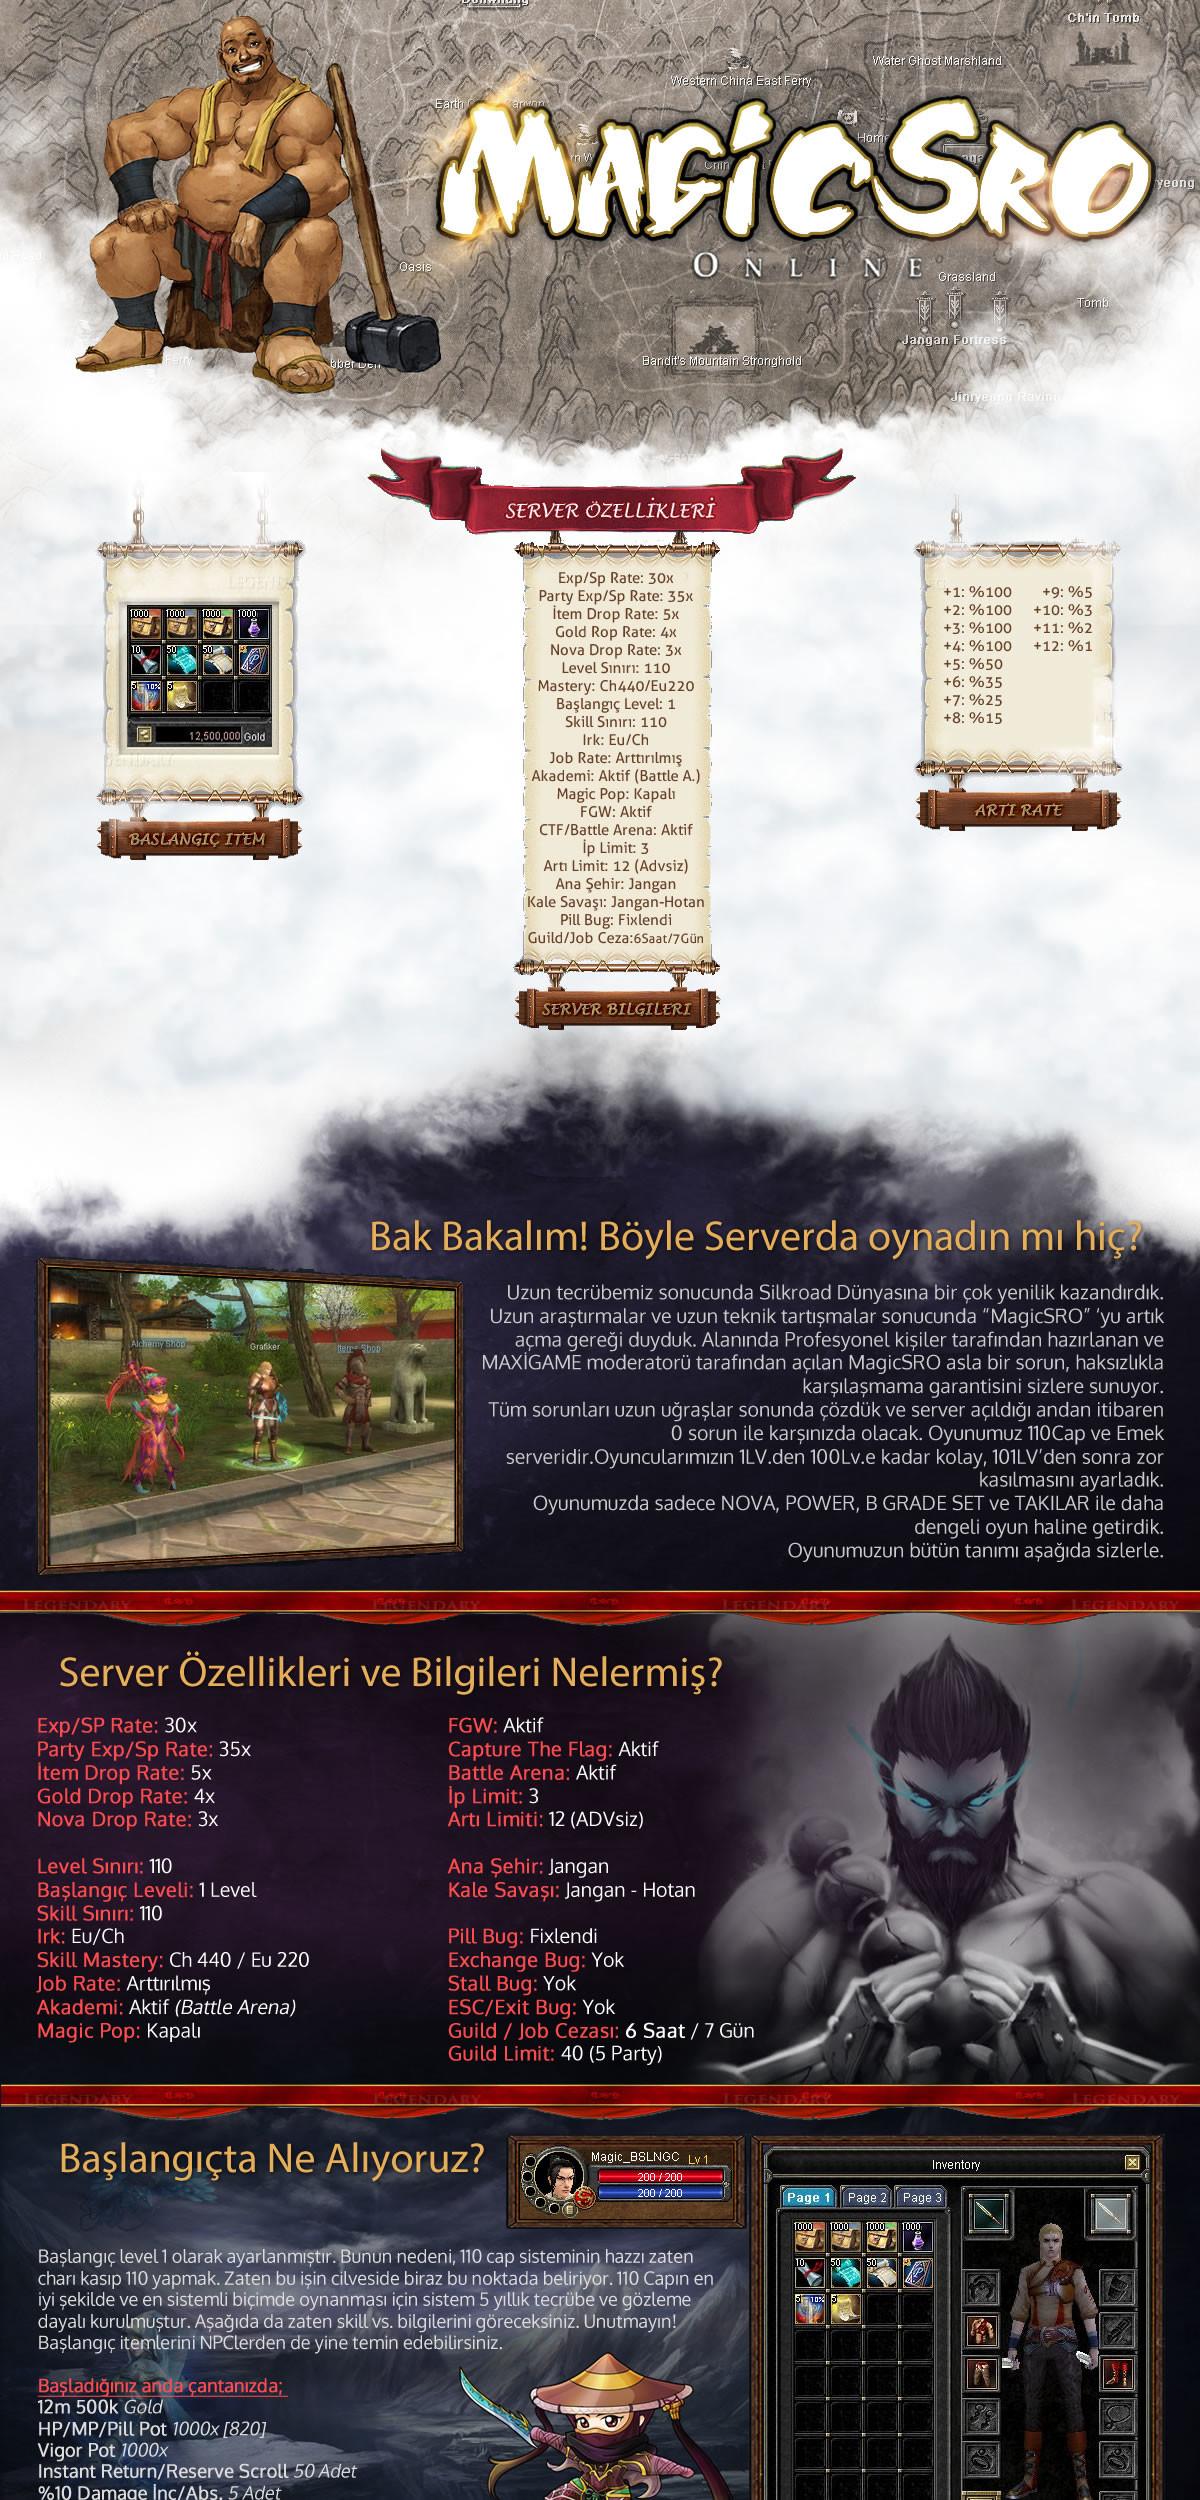 magicsro server, pvp serverlar